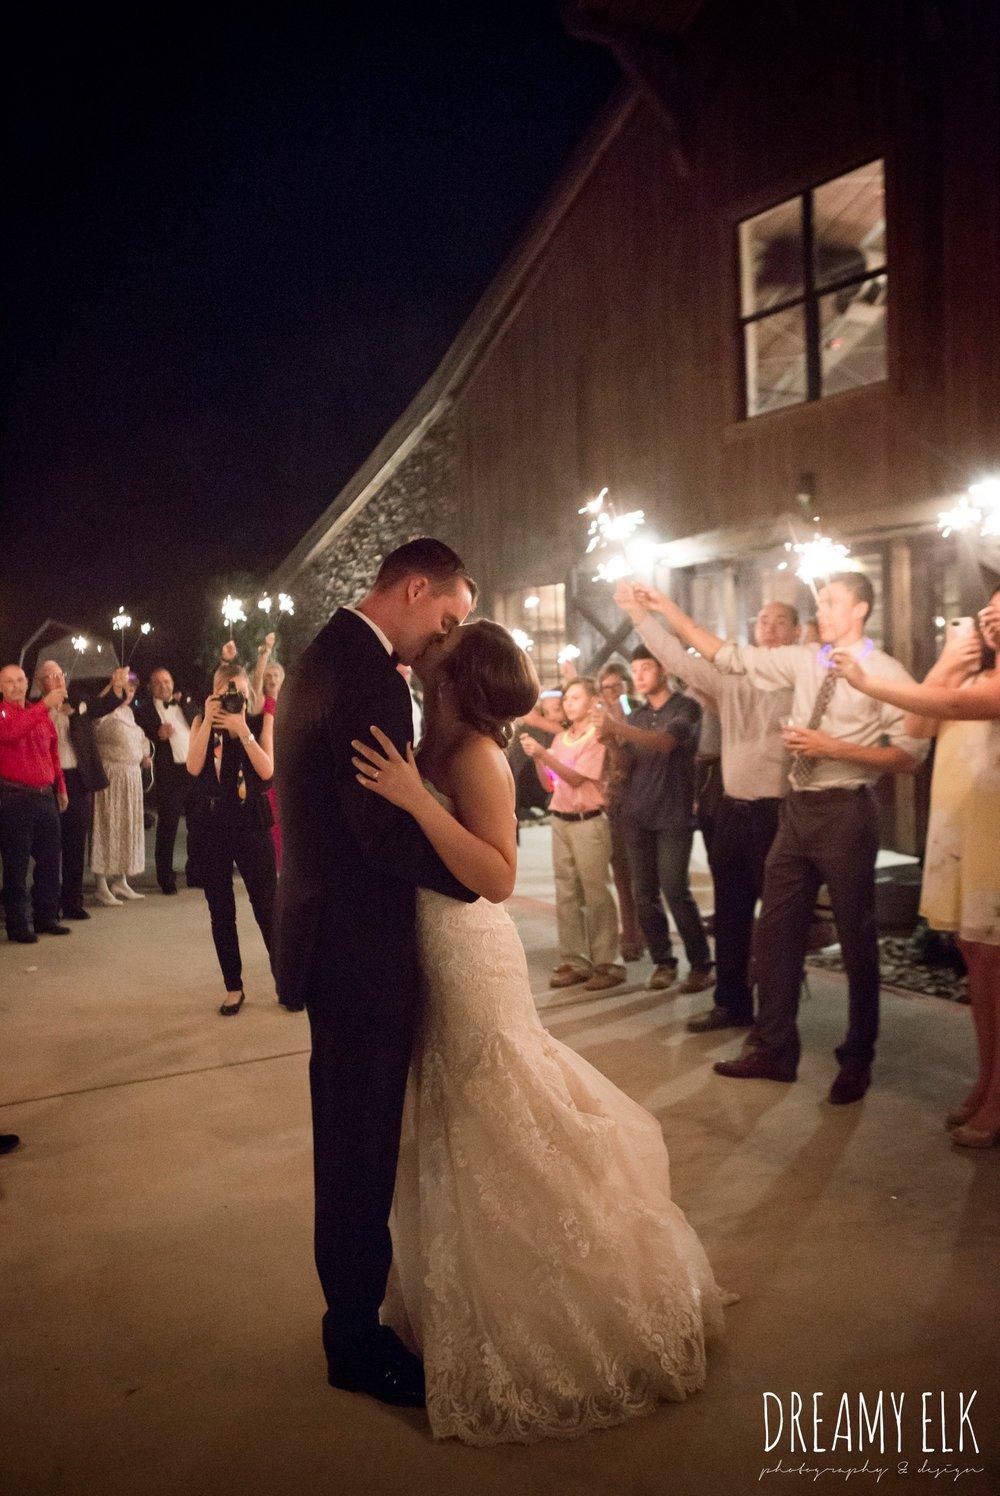 sparkler send off, bride and groom kissing, summer july wedding, lavender, big sky barn, houston, texas, austin wedding photographer {dreamy elk photography and design} photo